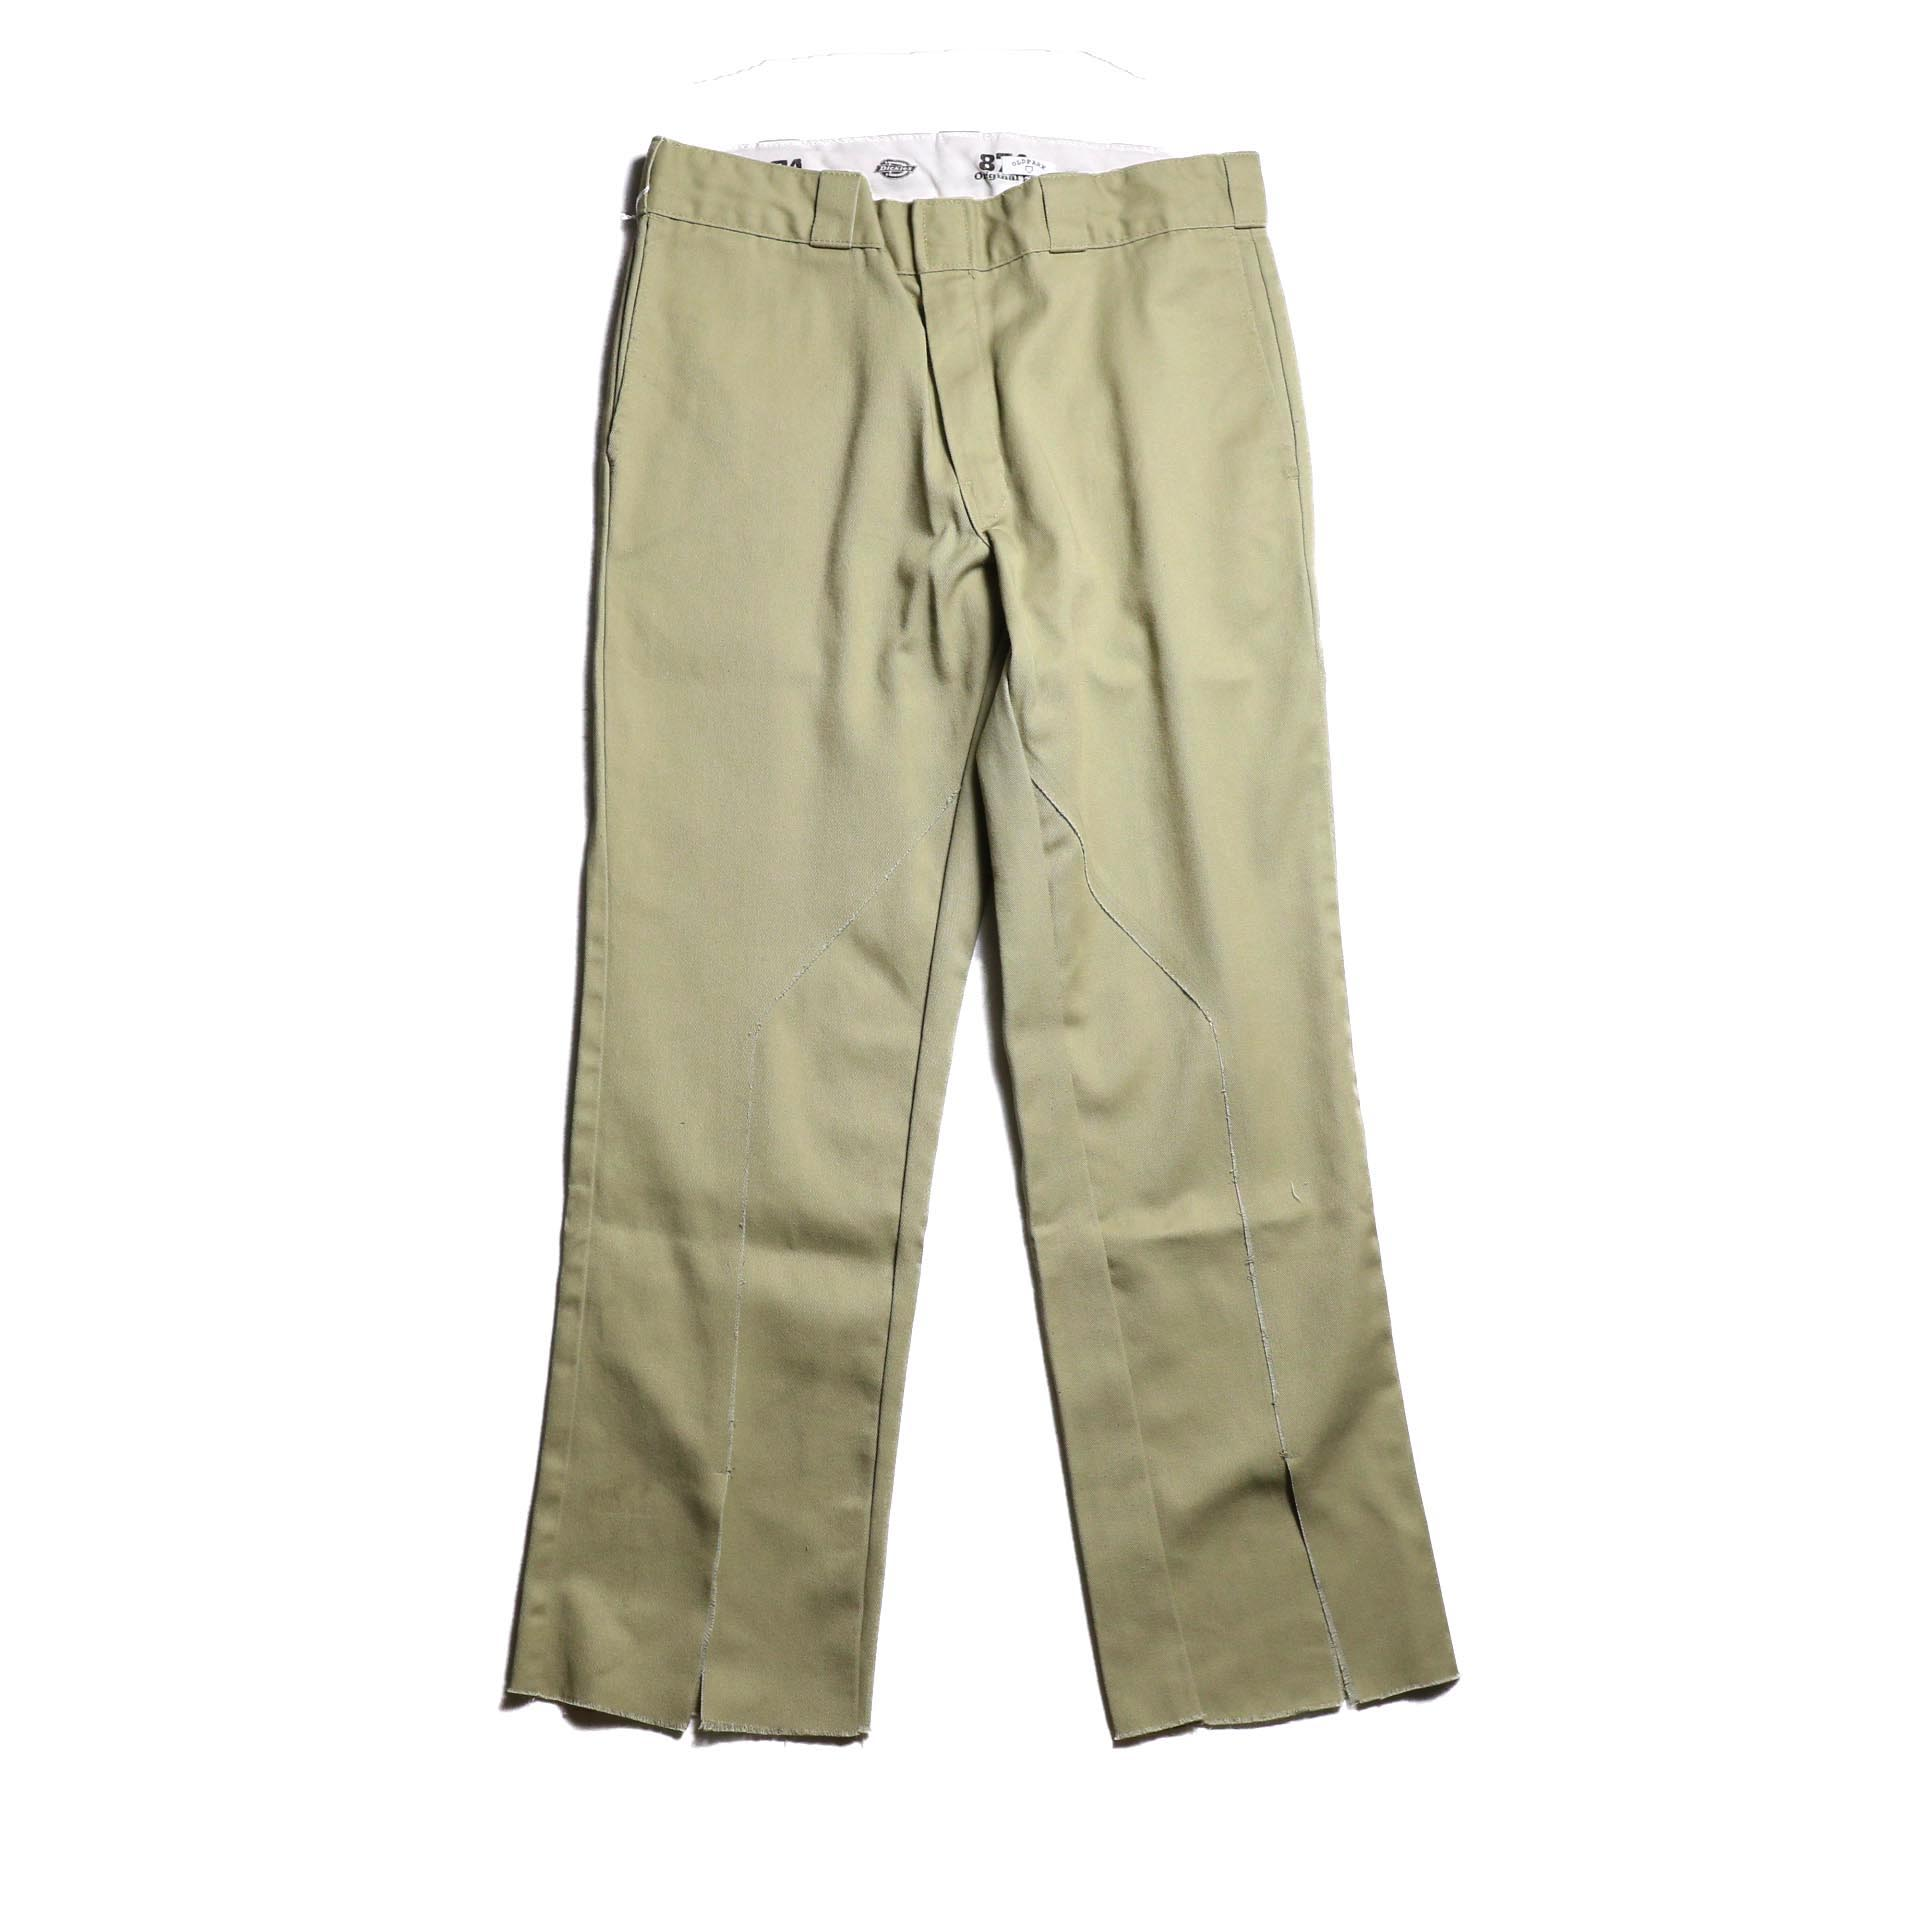 "OLD PARK / Slit Pants ""Dickies"" -Beige (Lsize)"